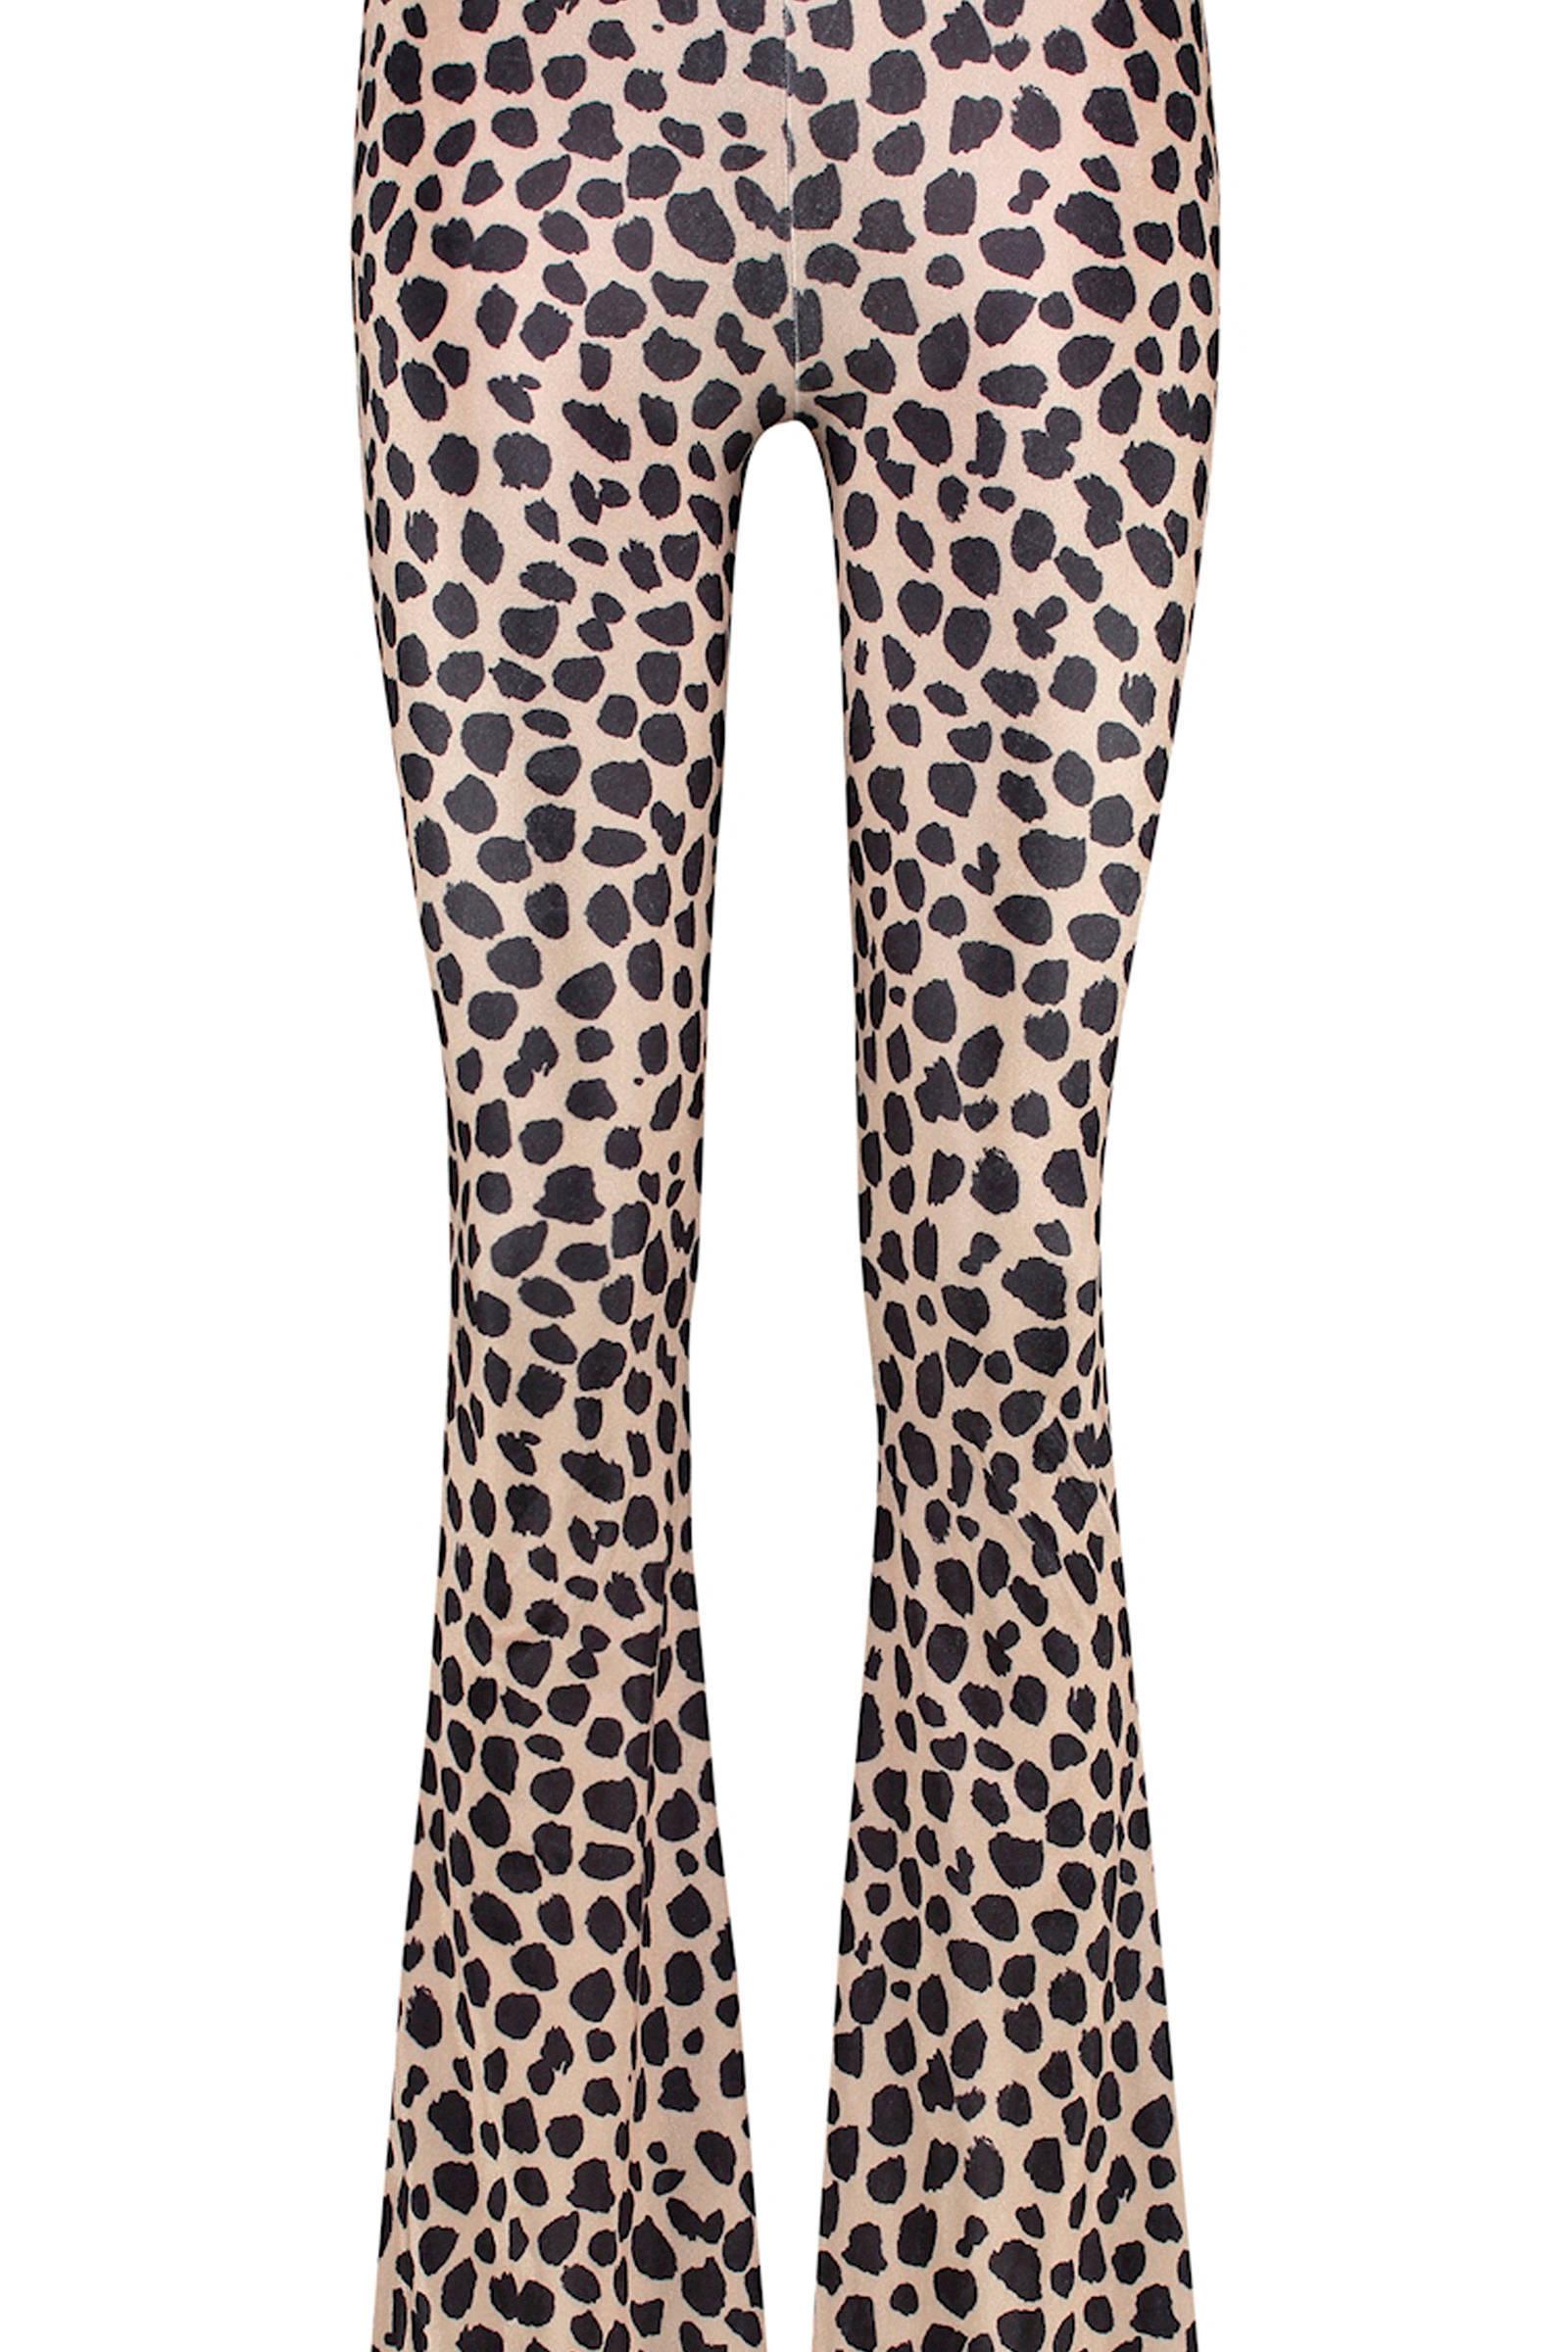 flared broek Leopard clash met dierenprint beigezwart